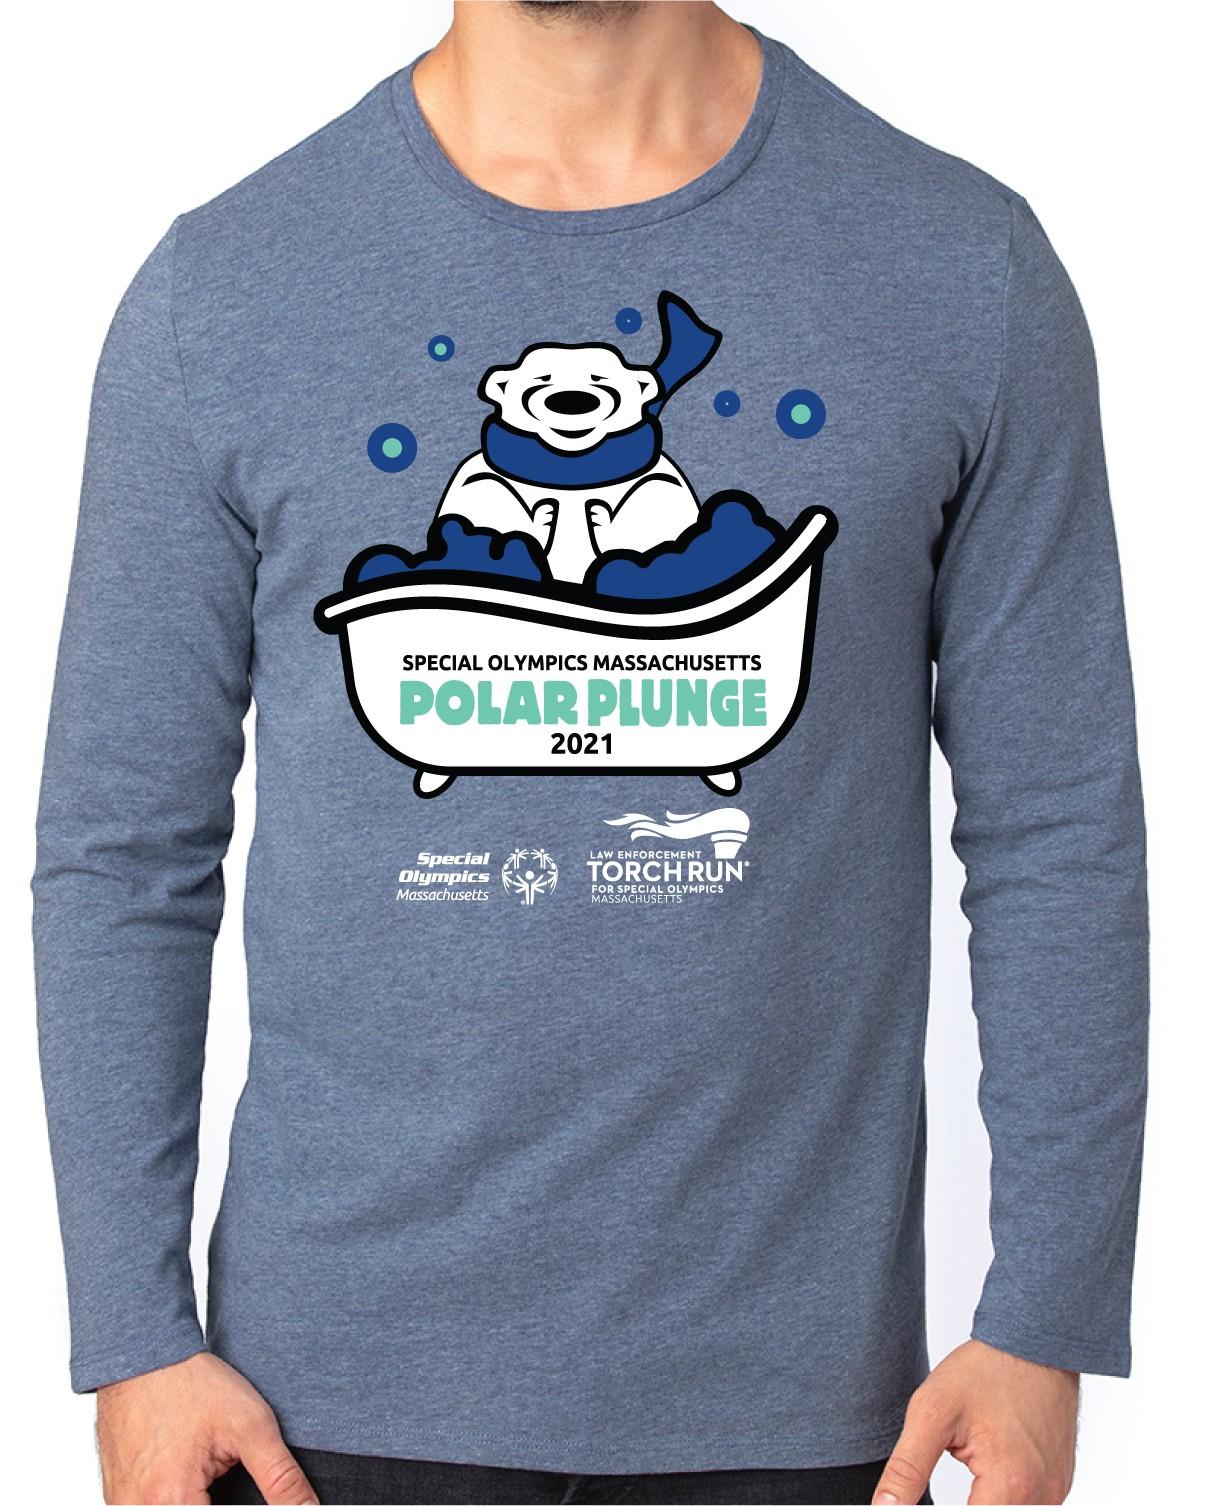 Option 1 T-Shirt Design - Polar Bear with scarf in bubble bath.